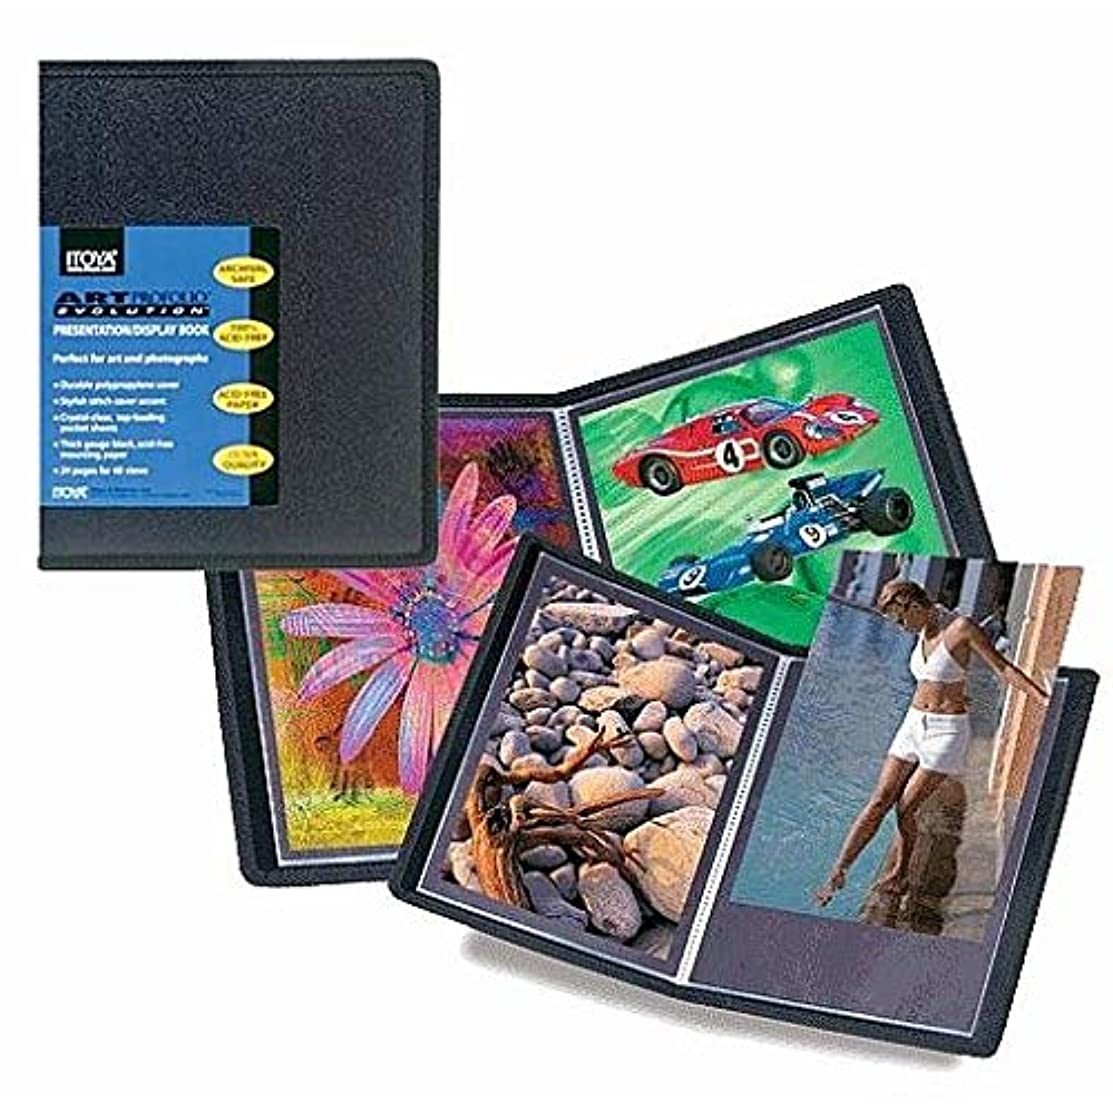 ProFolio Art ProFolio Evolution Presentation Display Book - Portrait, 8.5 x 11 Inches